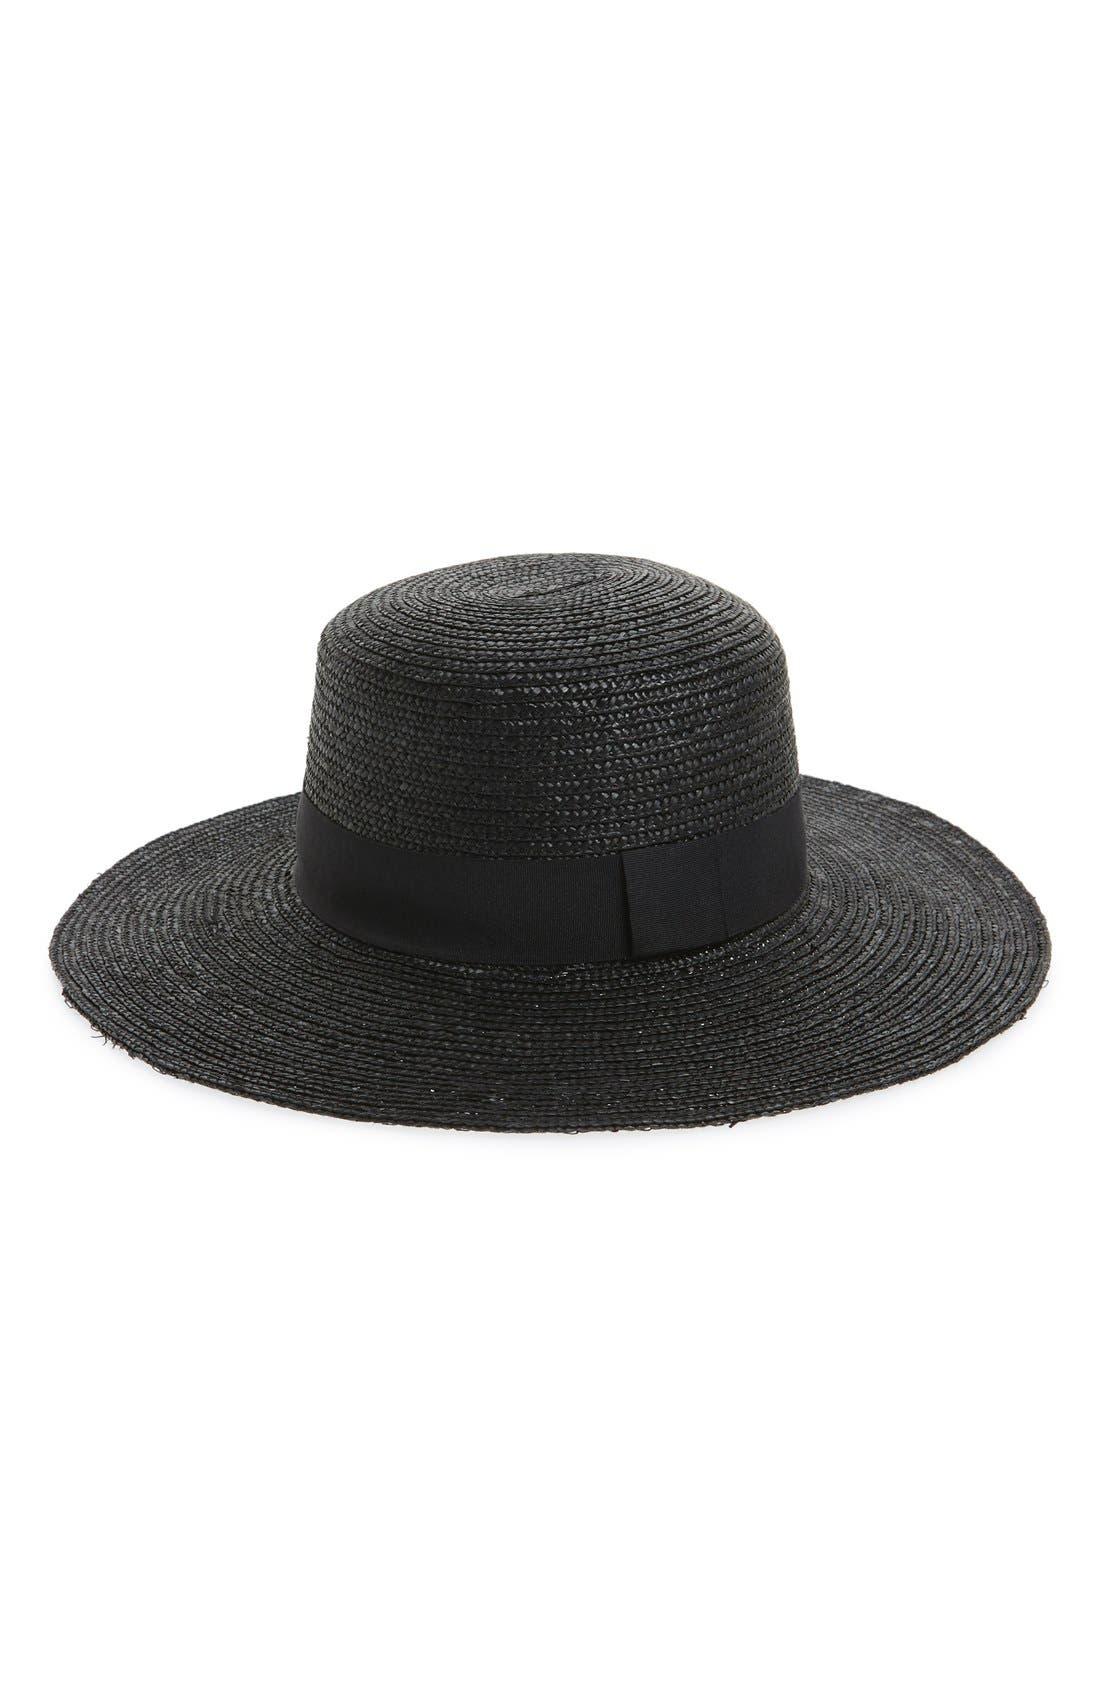 Wide Brim Boater Hat,                             Main thumbnail 1, color,                             001